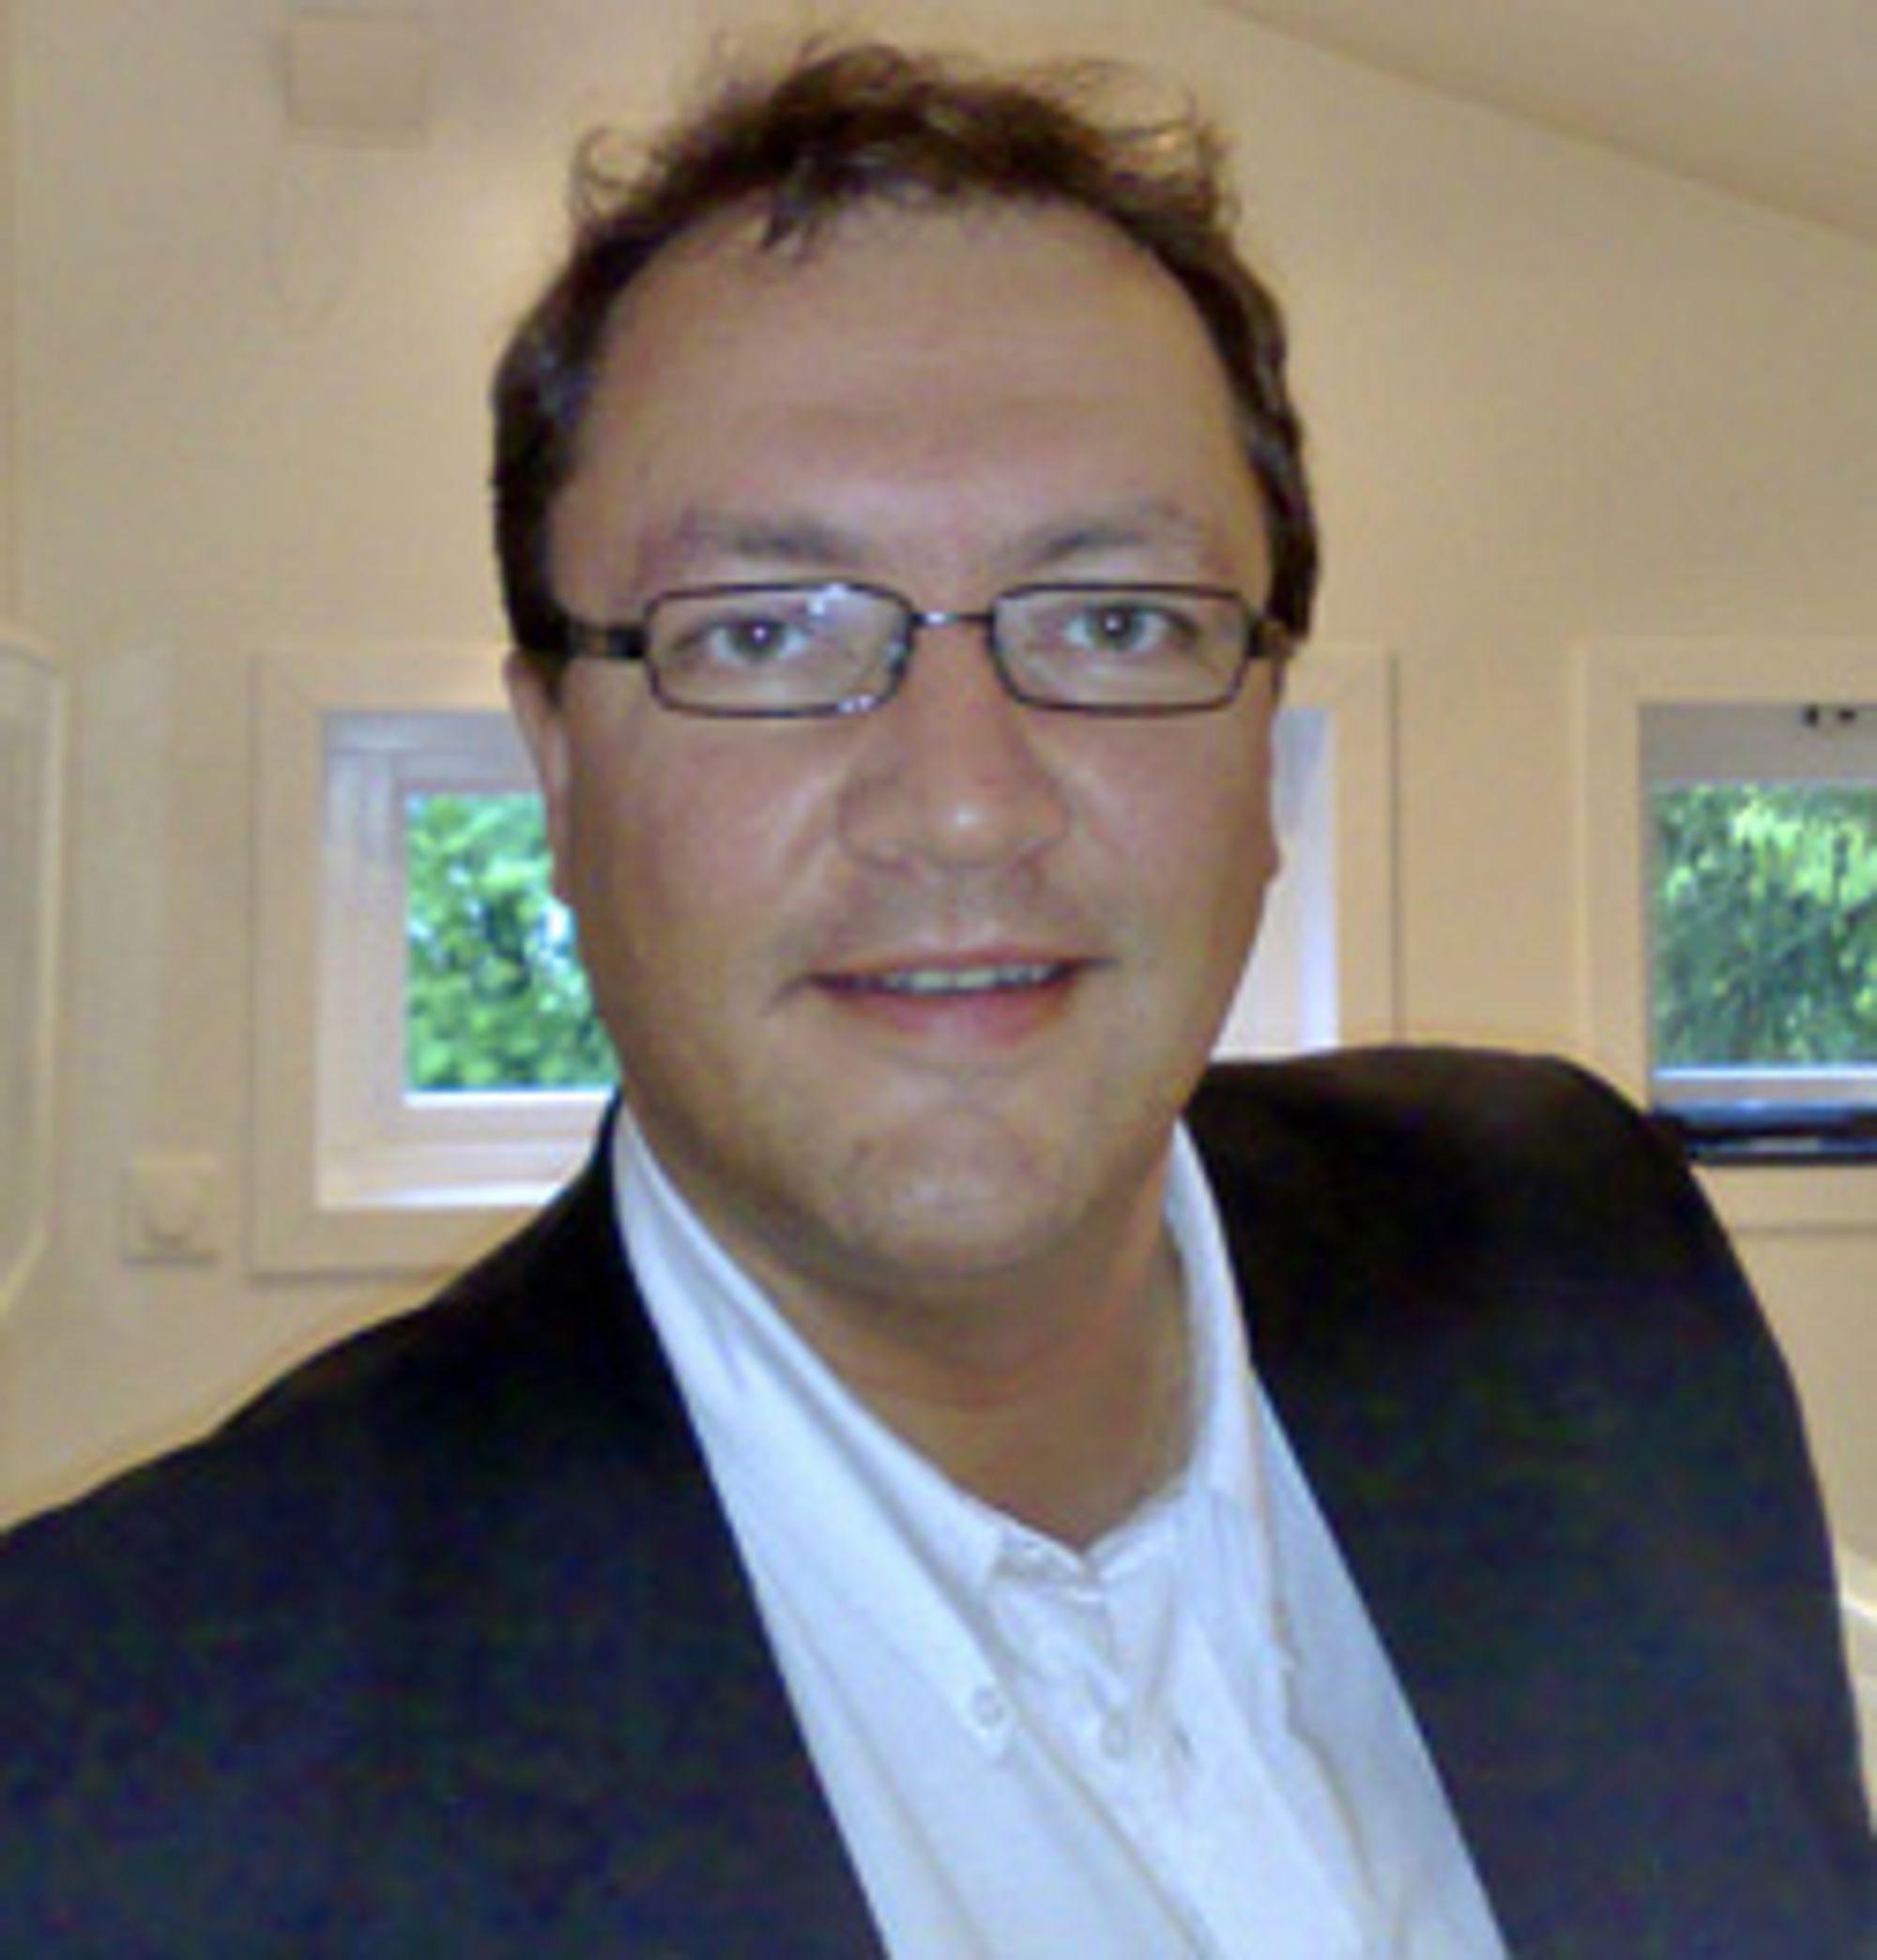 MTUs Jo Lerheim mener Norsk Miljøvernforbund er erstatningsansvarlig.